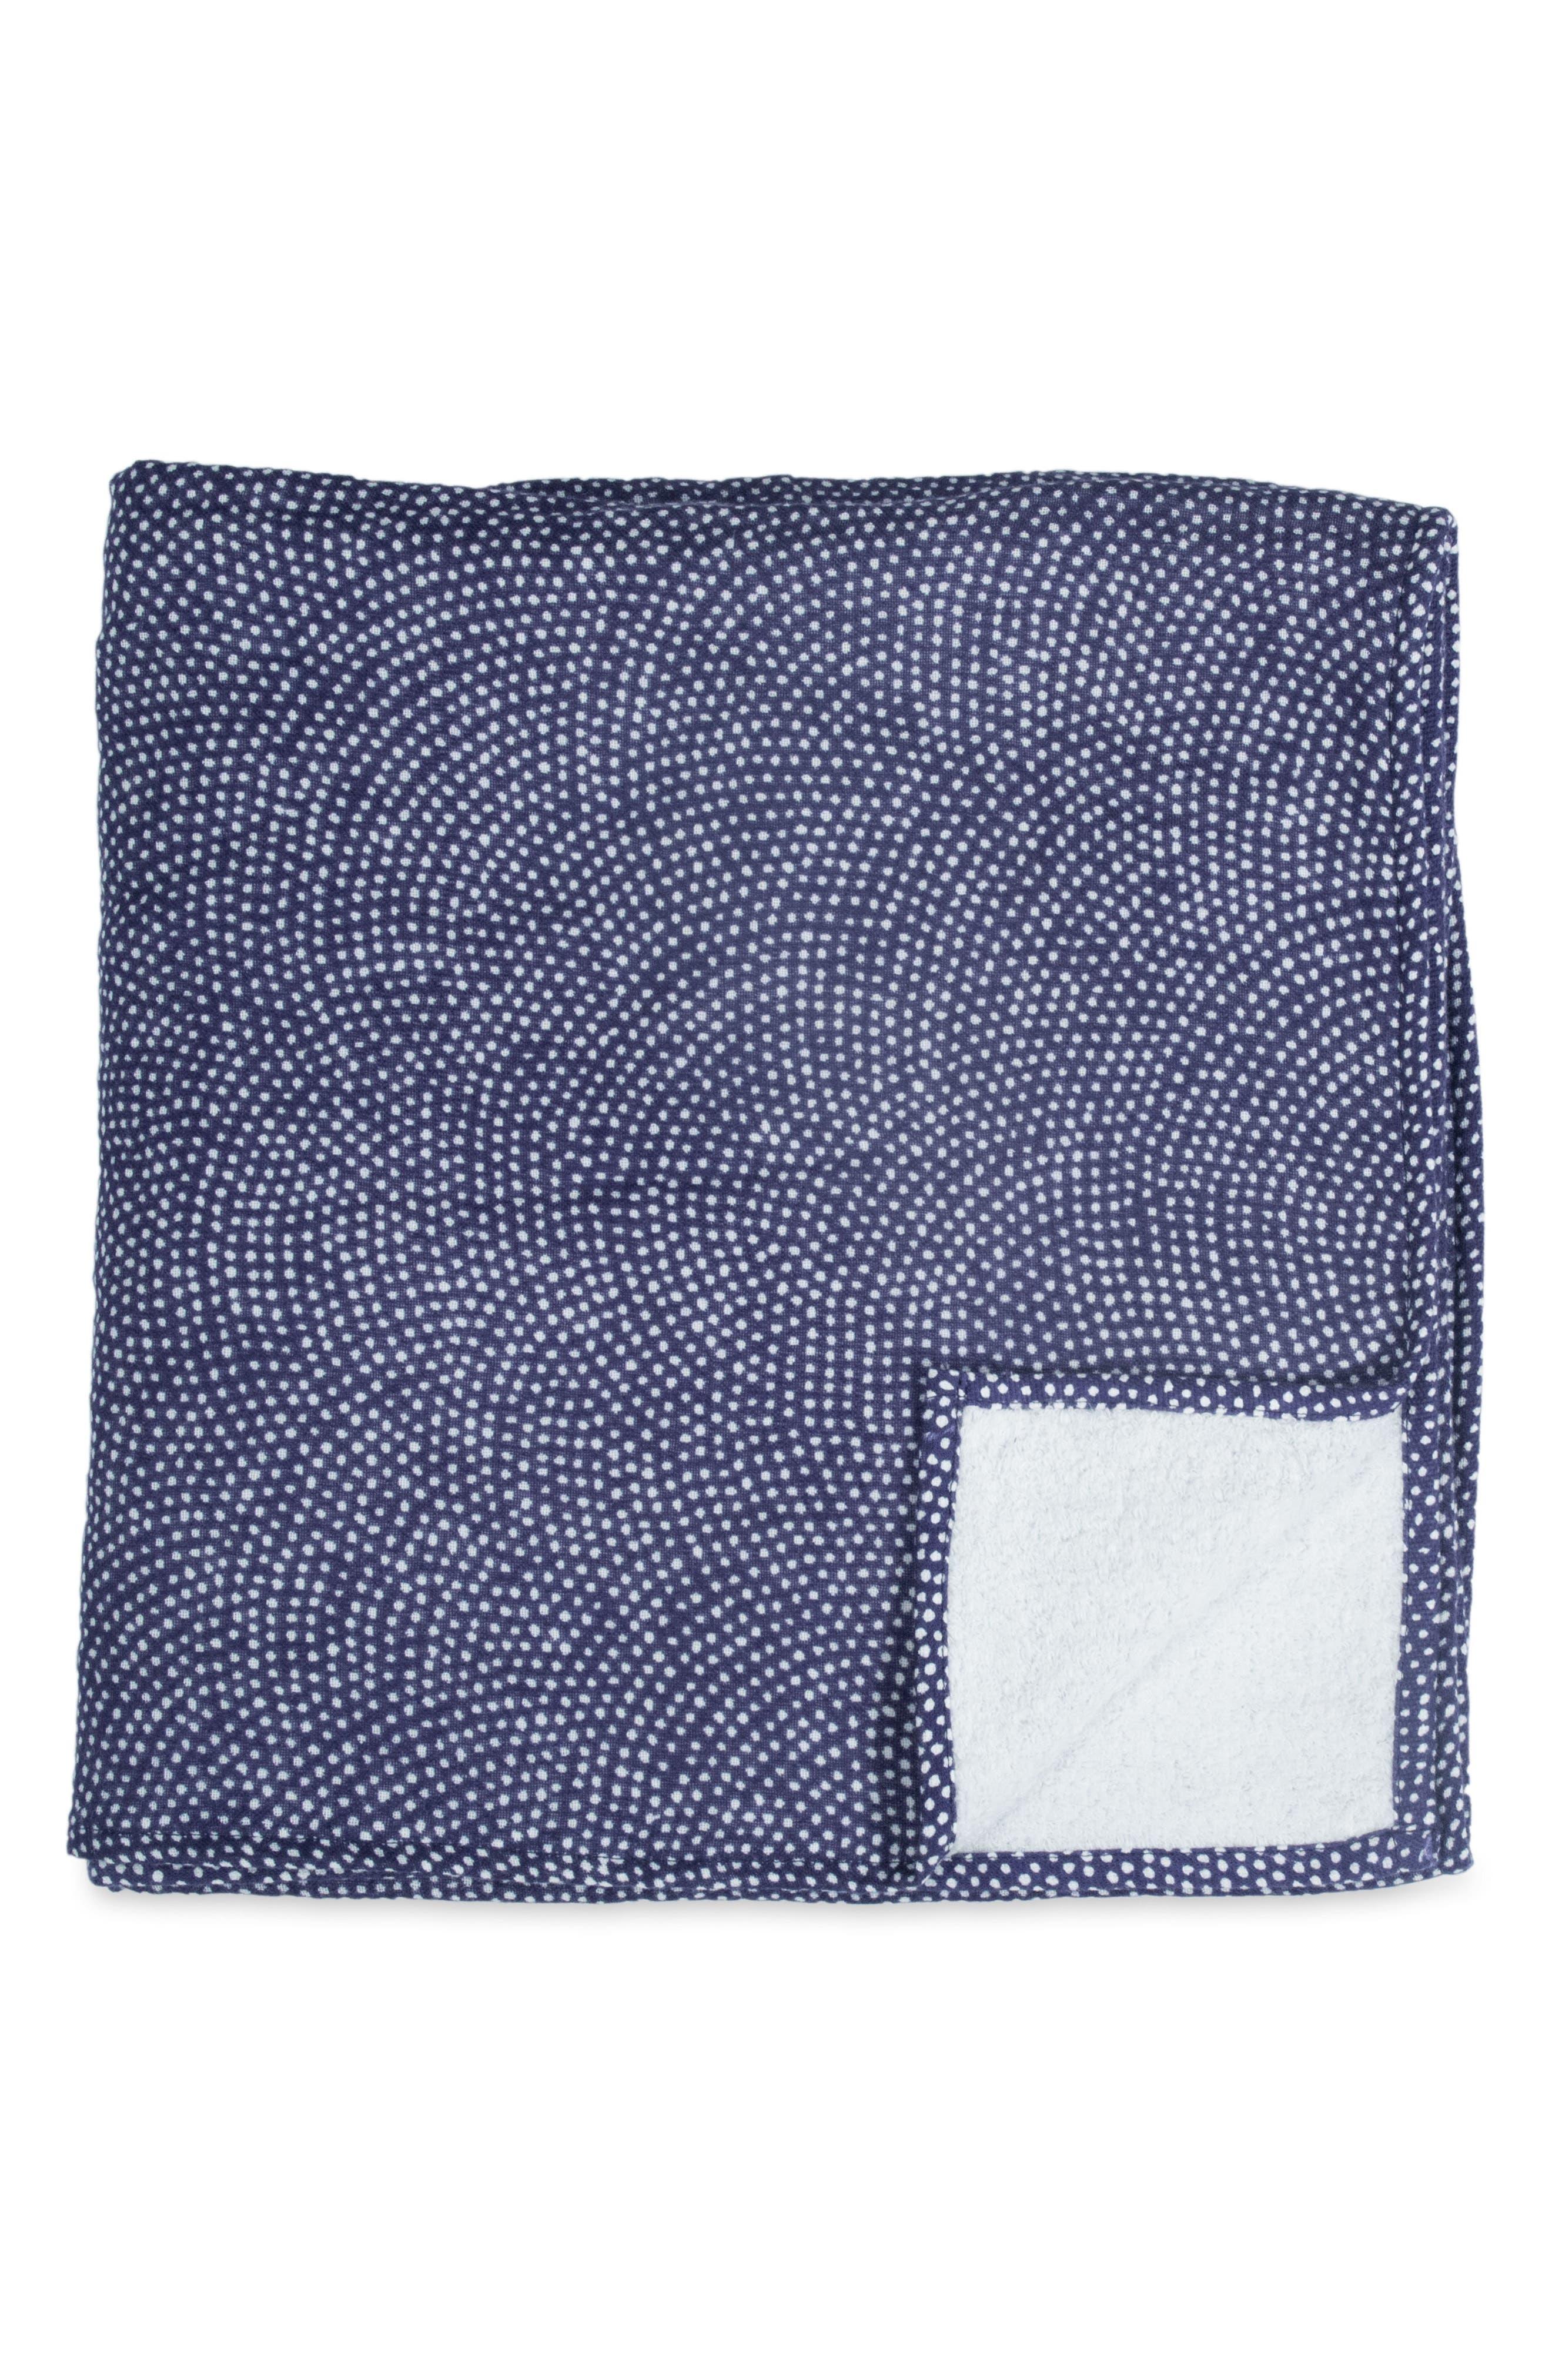 Zero Twist Print Bath Towel,                             Main thumbnail 1, color,                             Dark Blue